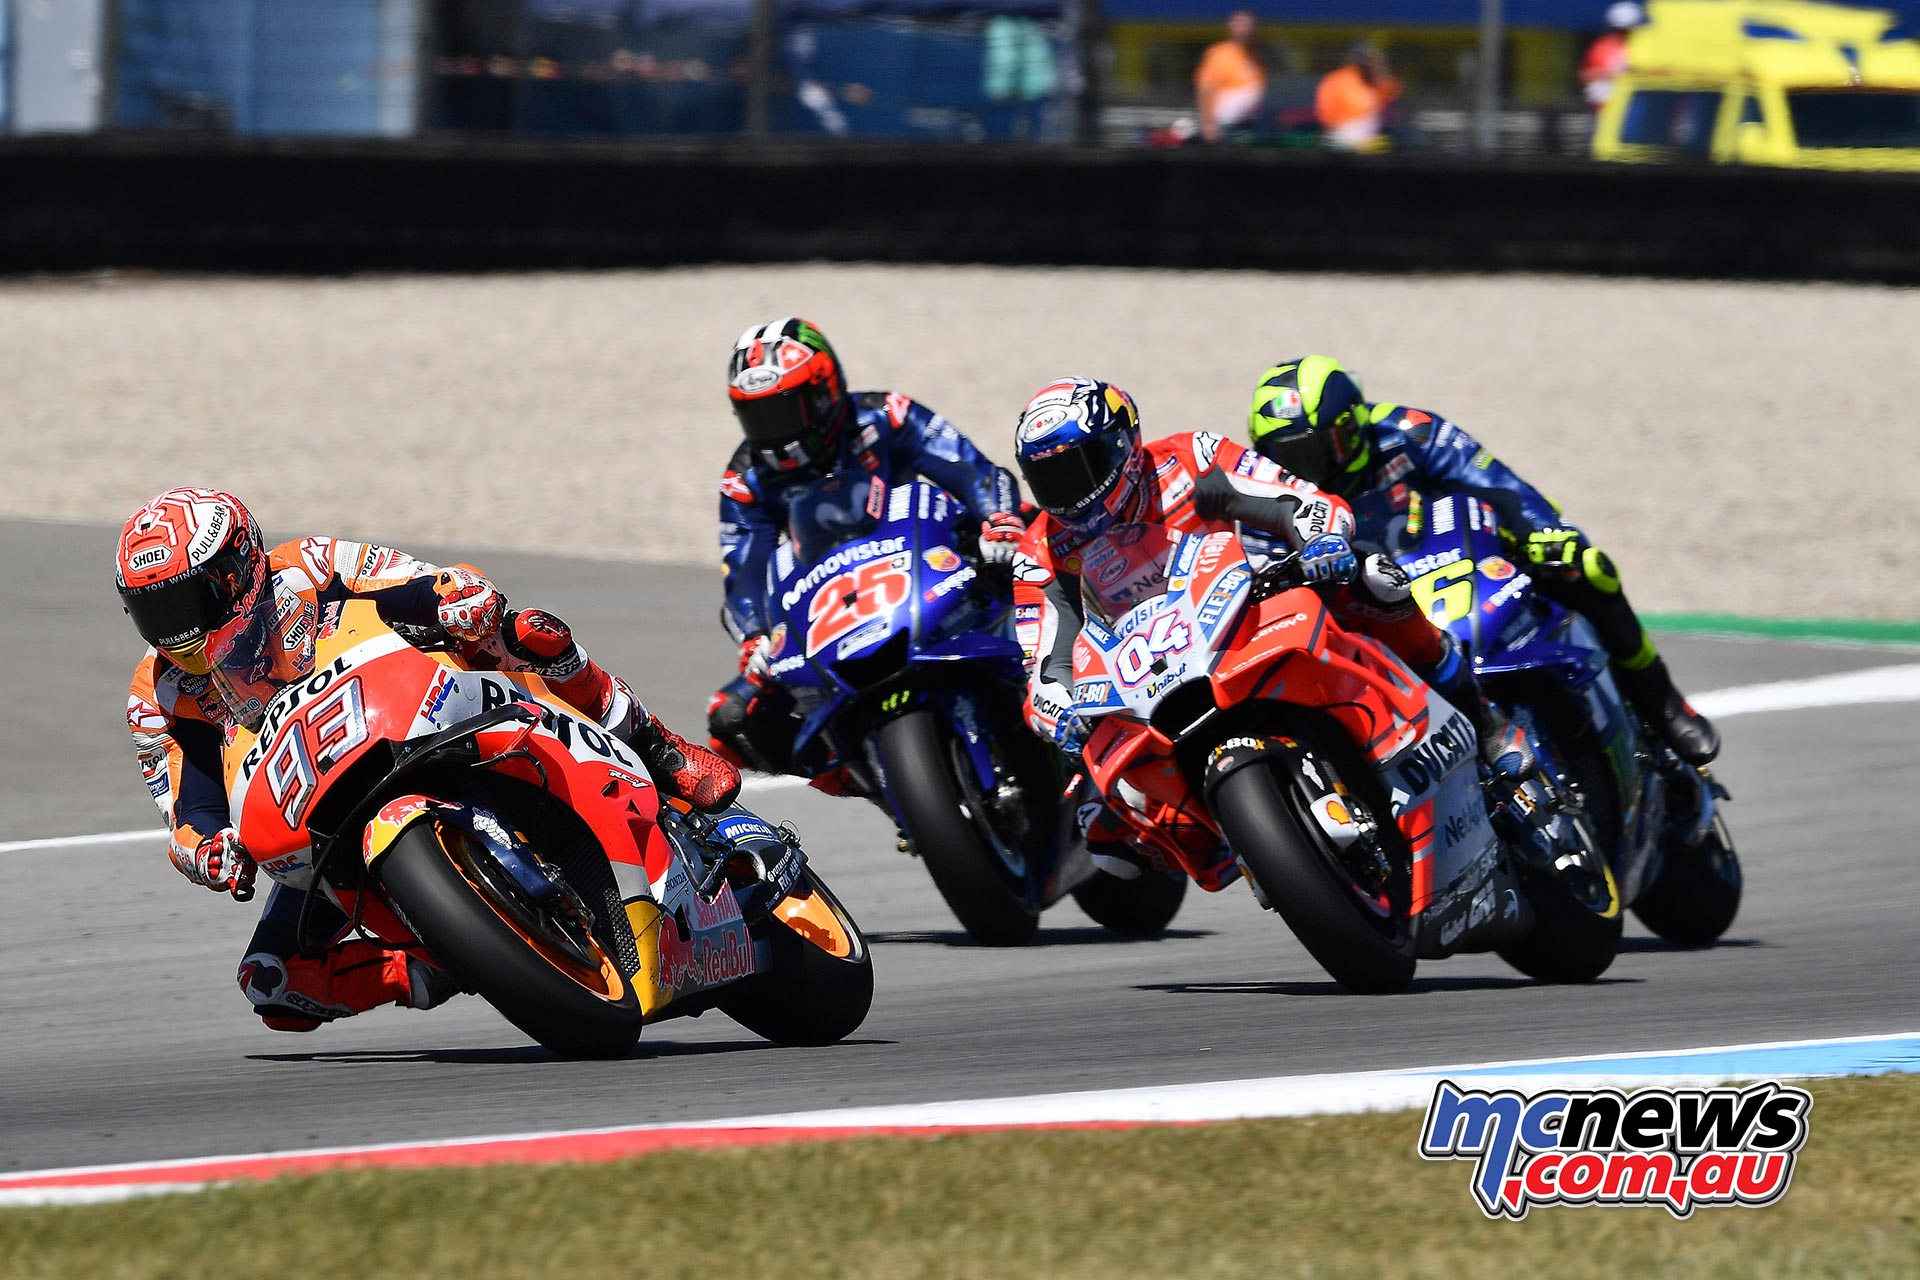 MotoGP Assen Race Marquez